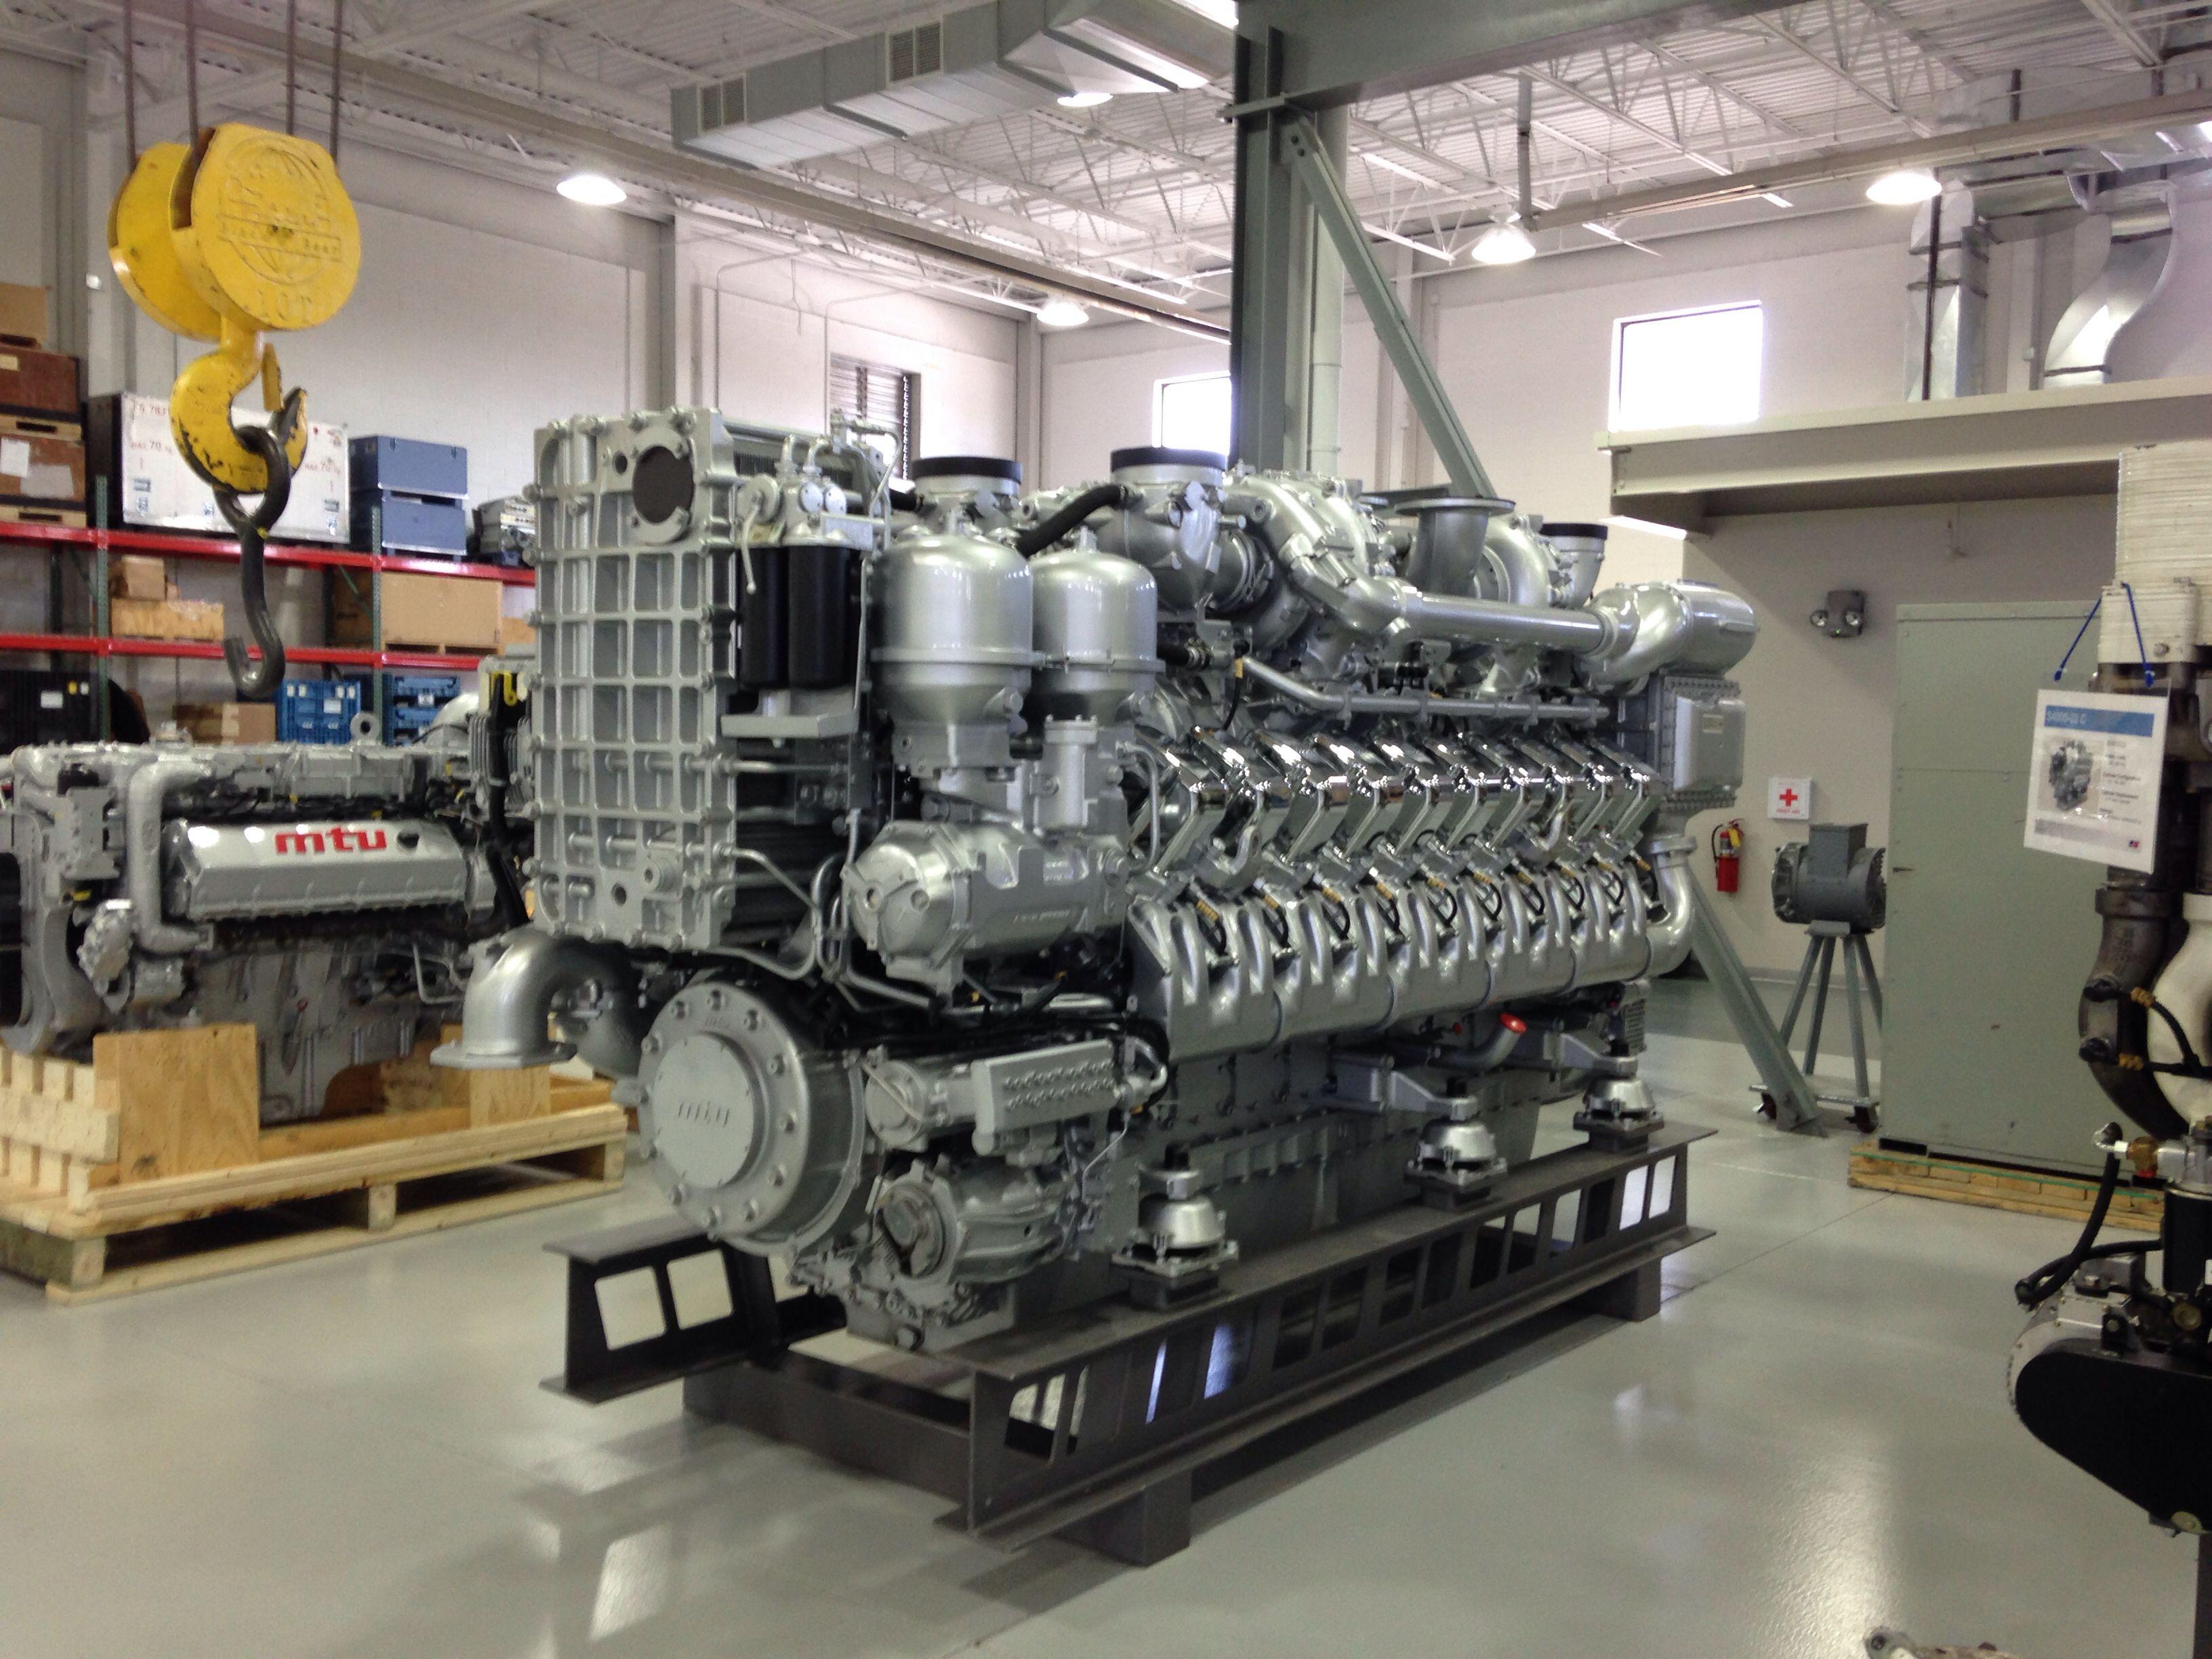 20v4000 show engine dieselyachtsengineeringboats